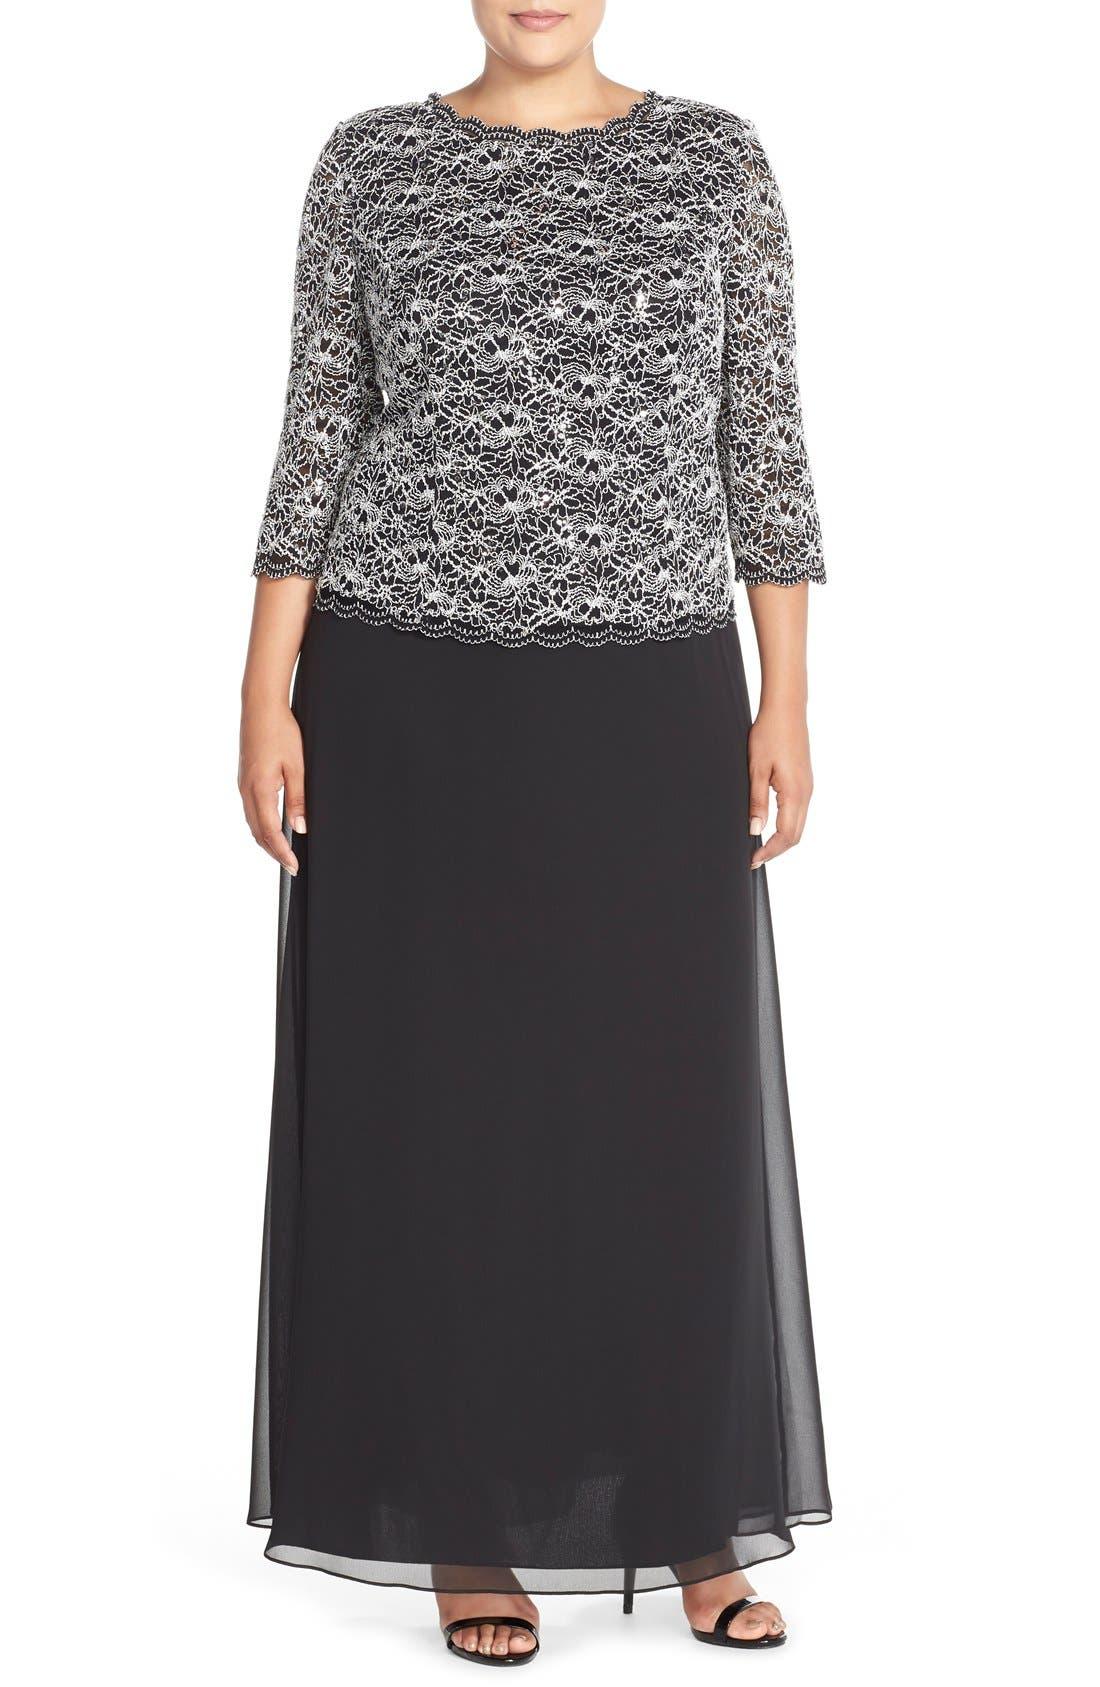 Mock Two-Piece Lace & Chiffon A-Line Gown,                             Main thumbnail 1, color,                             Black/ White